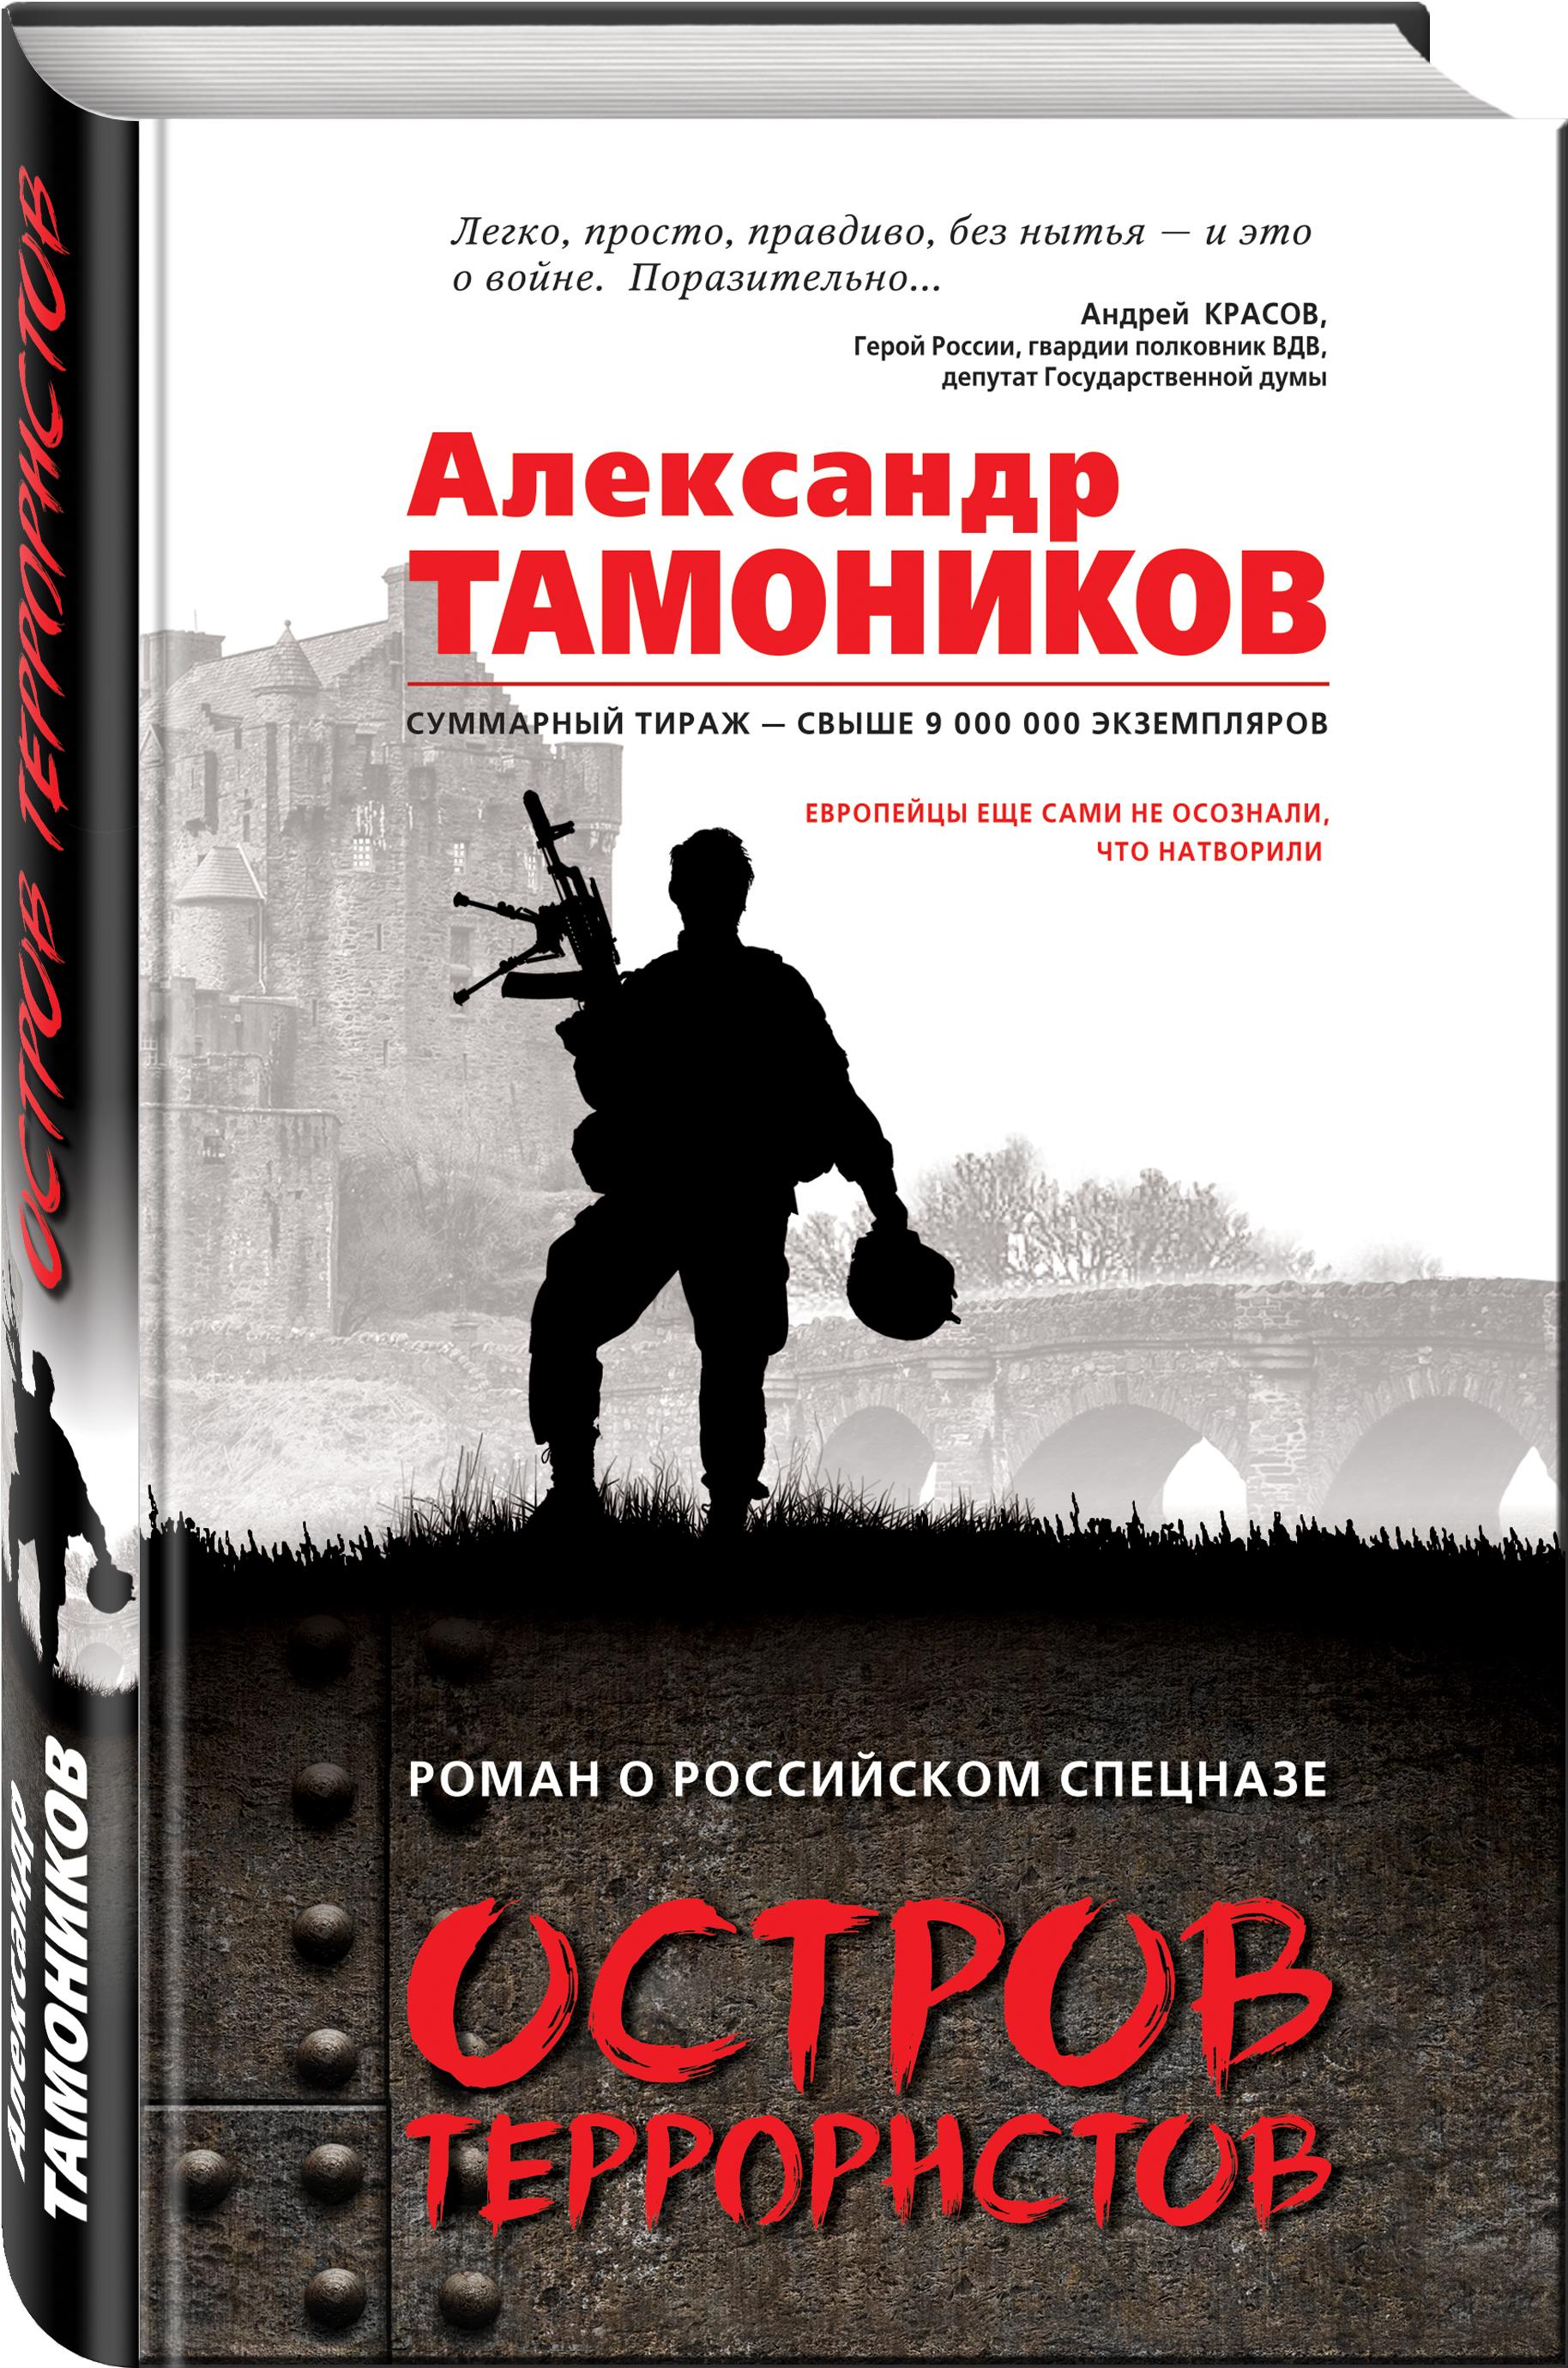 Остров террористов ( Тамоников А.А.  )